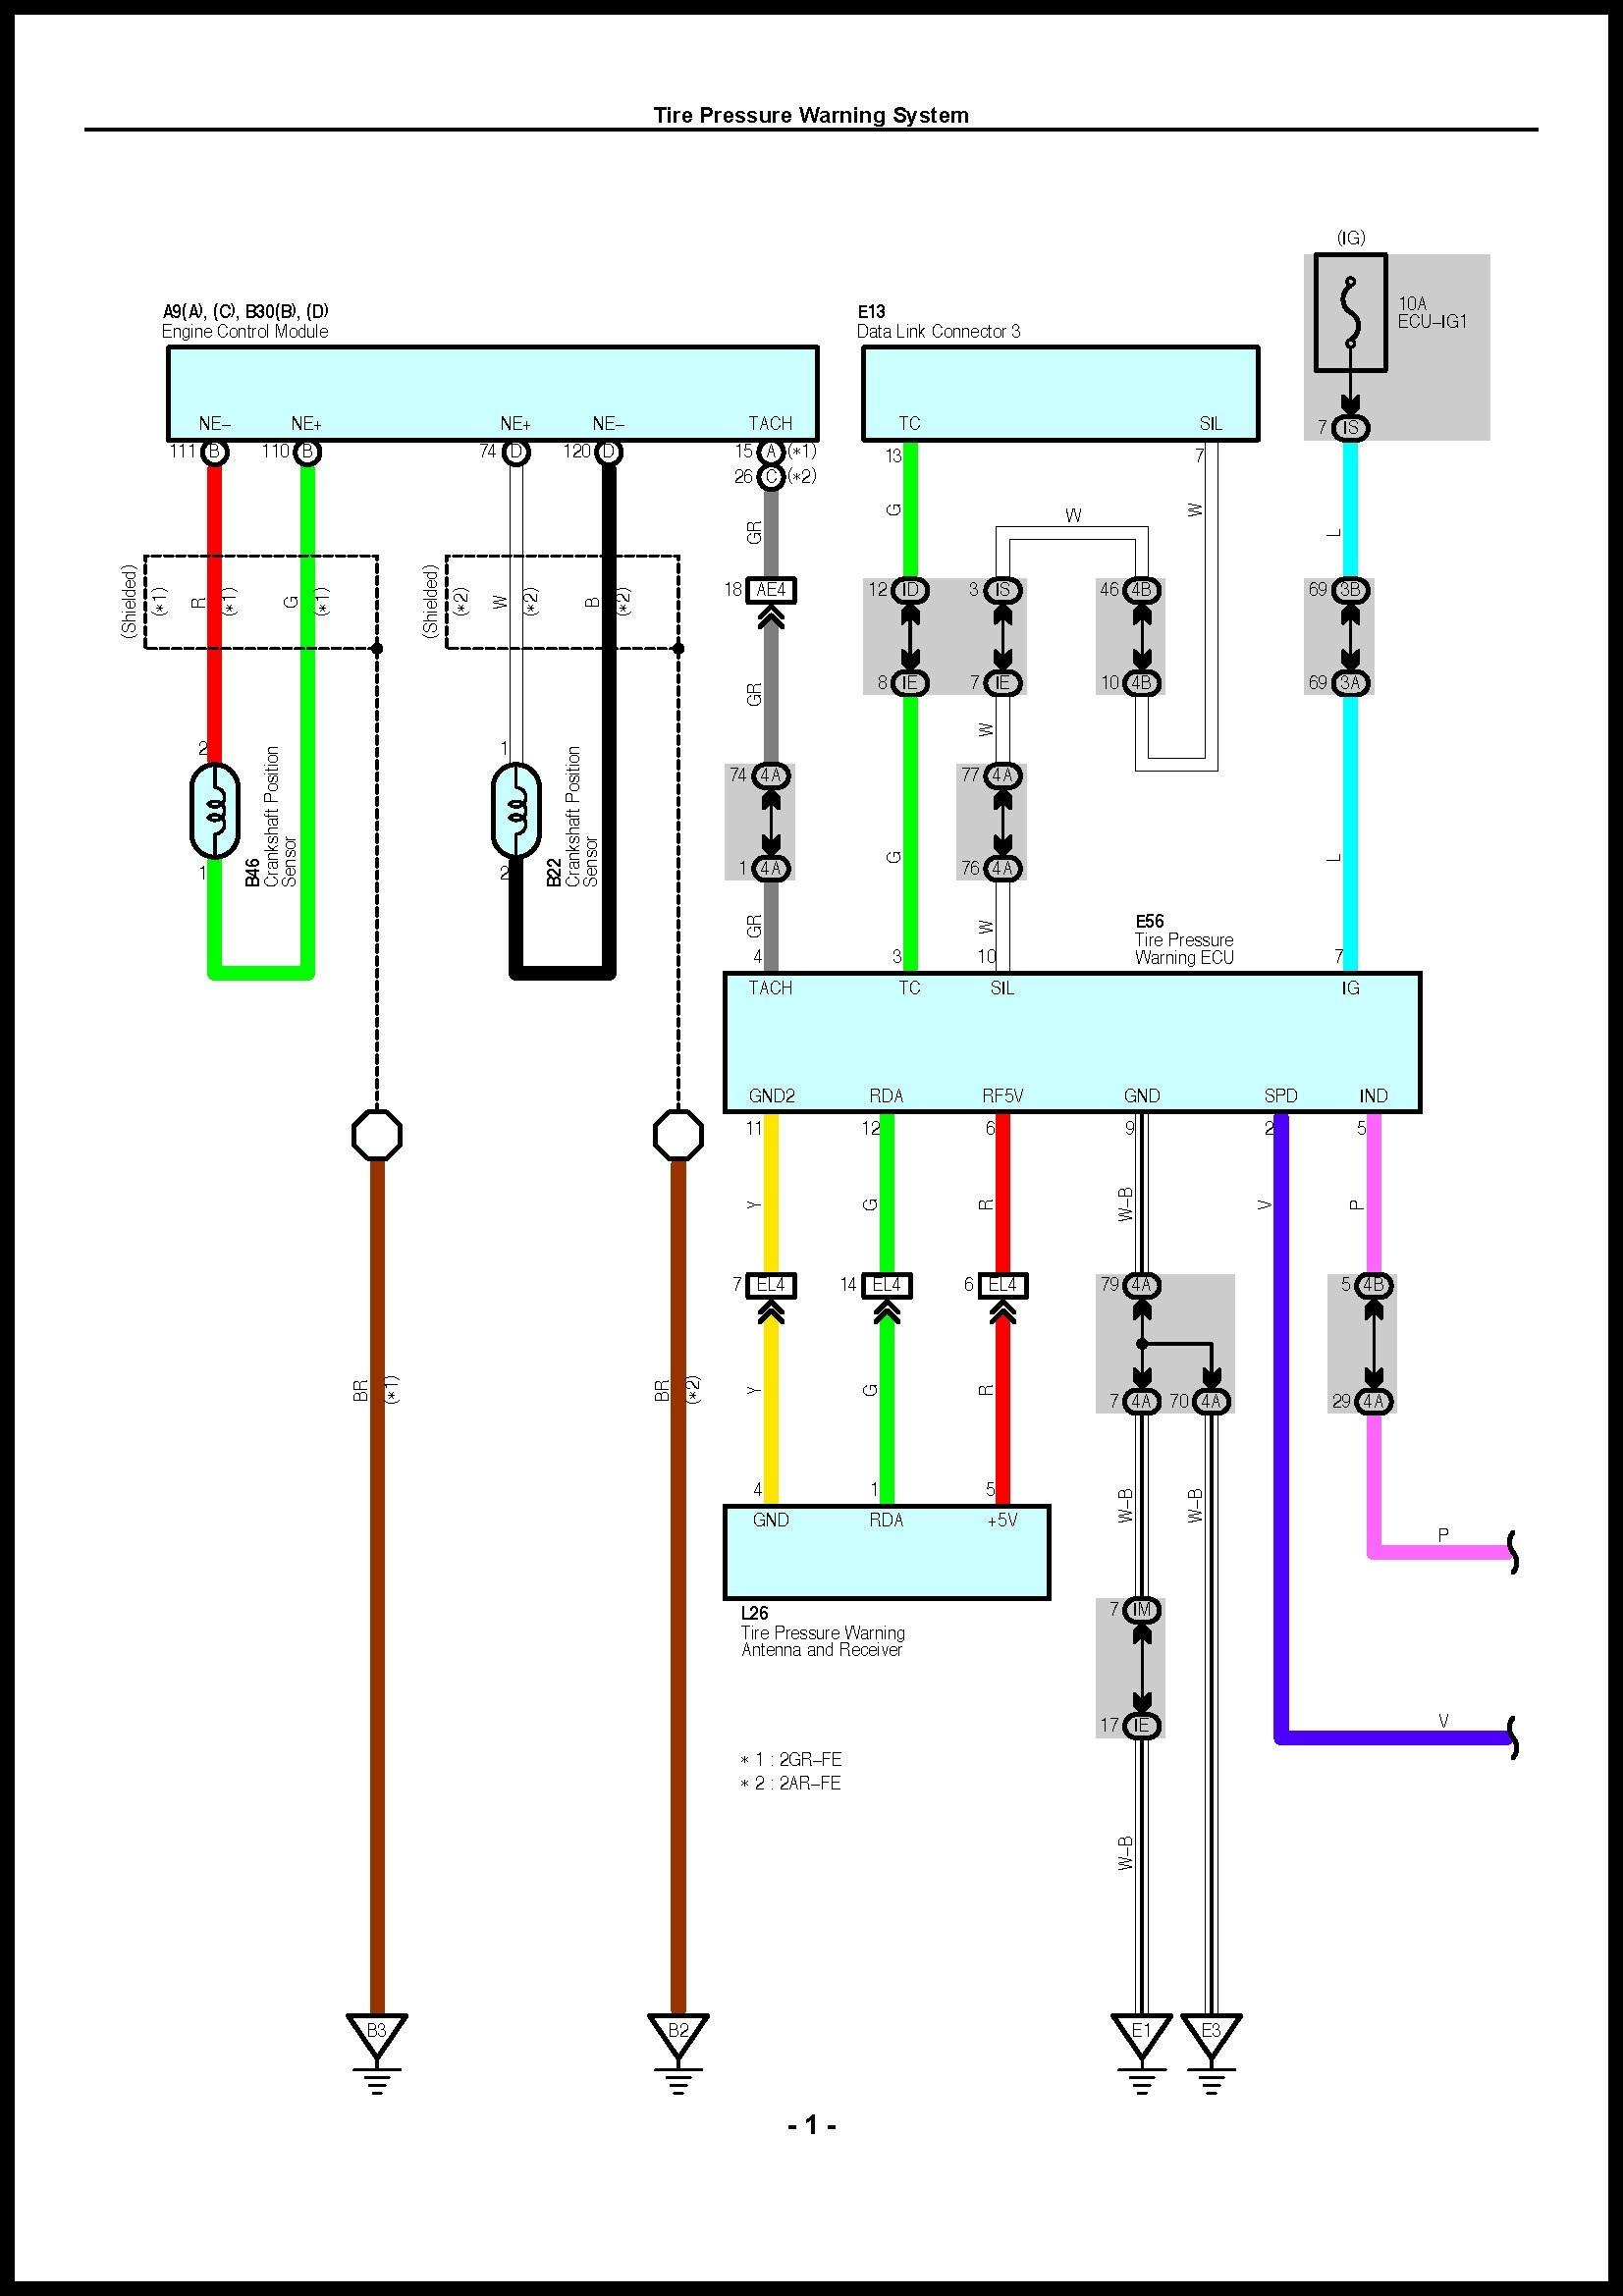 Toyota Maintenance Schedule Pdf Unique toyota Rav4 Engine Diagram 2011 2012 toyota Rav4 Oem Workshop